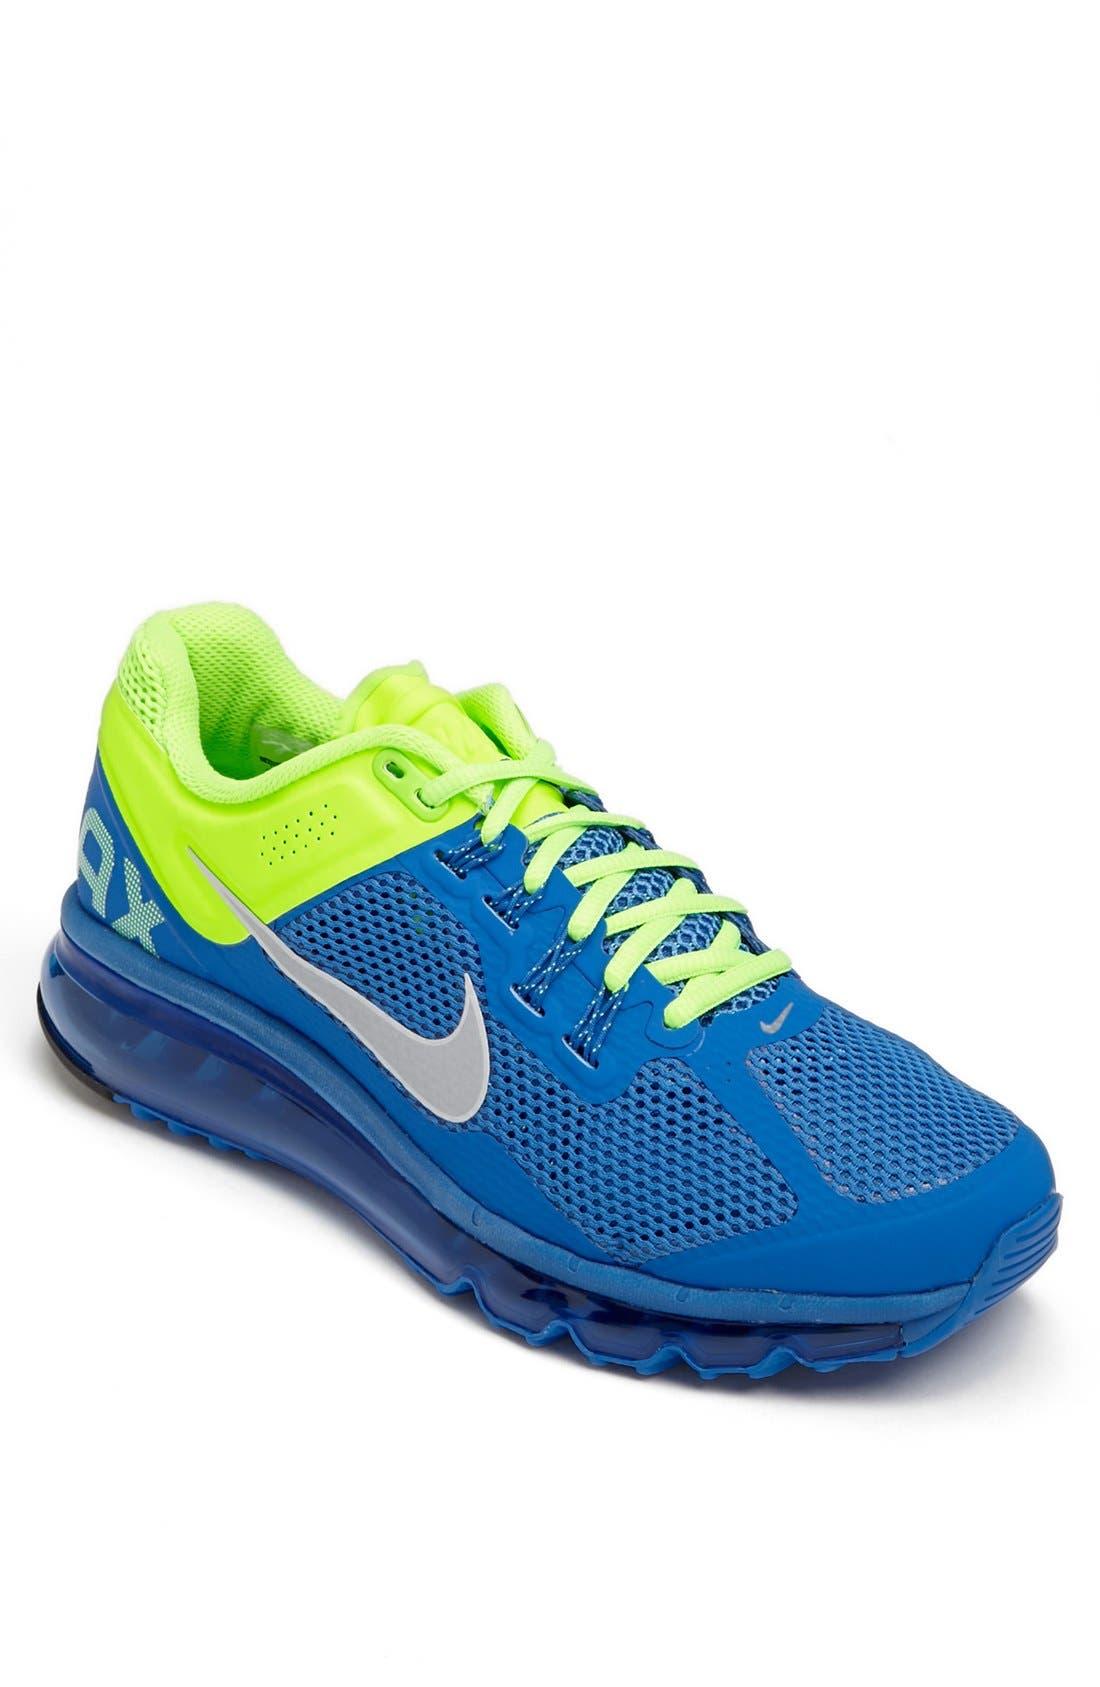 Main Image - Nike 'Air Max+ 2013' Running Shoe (Men)